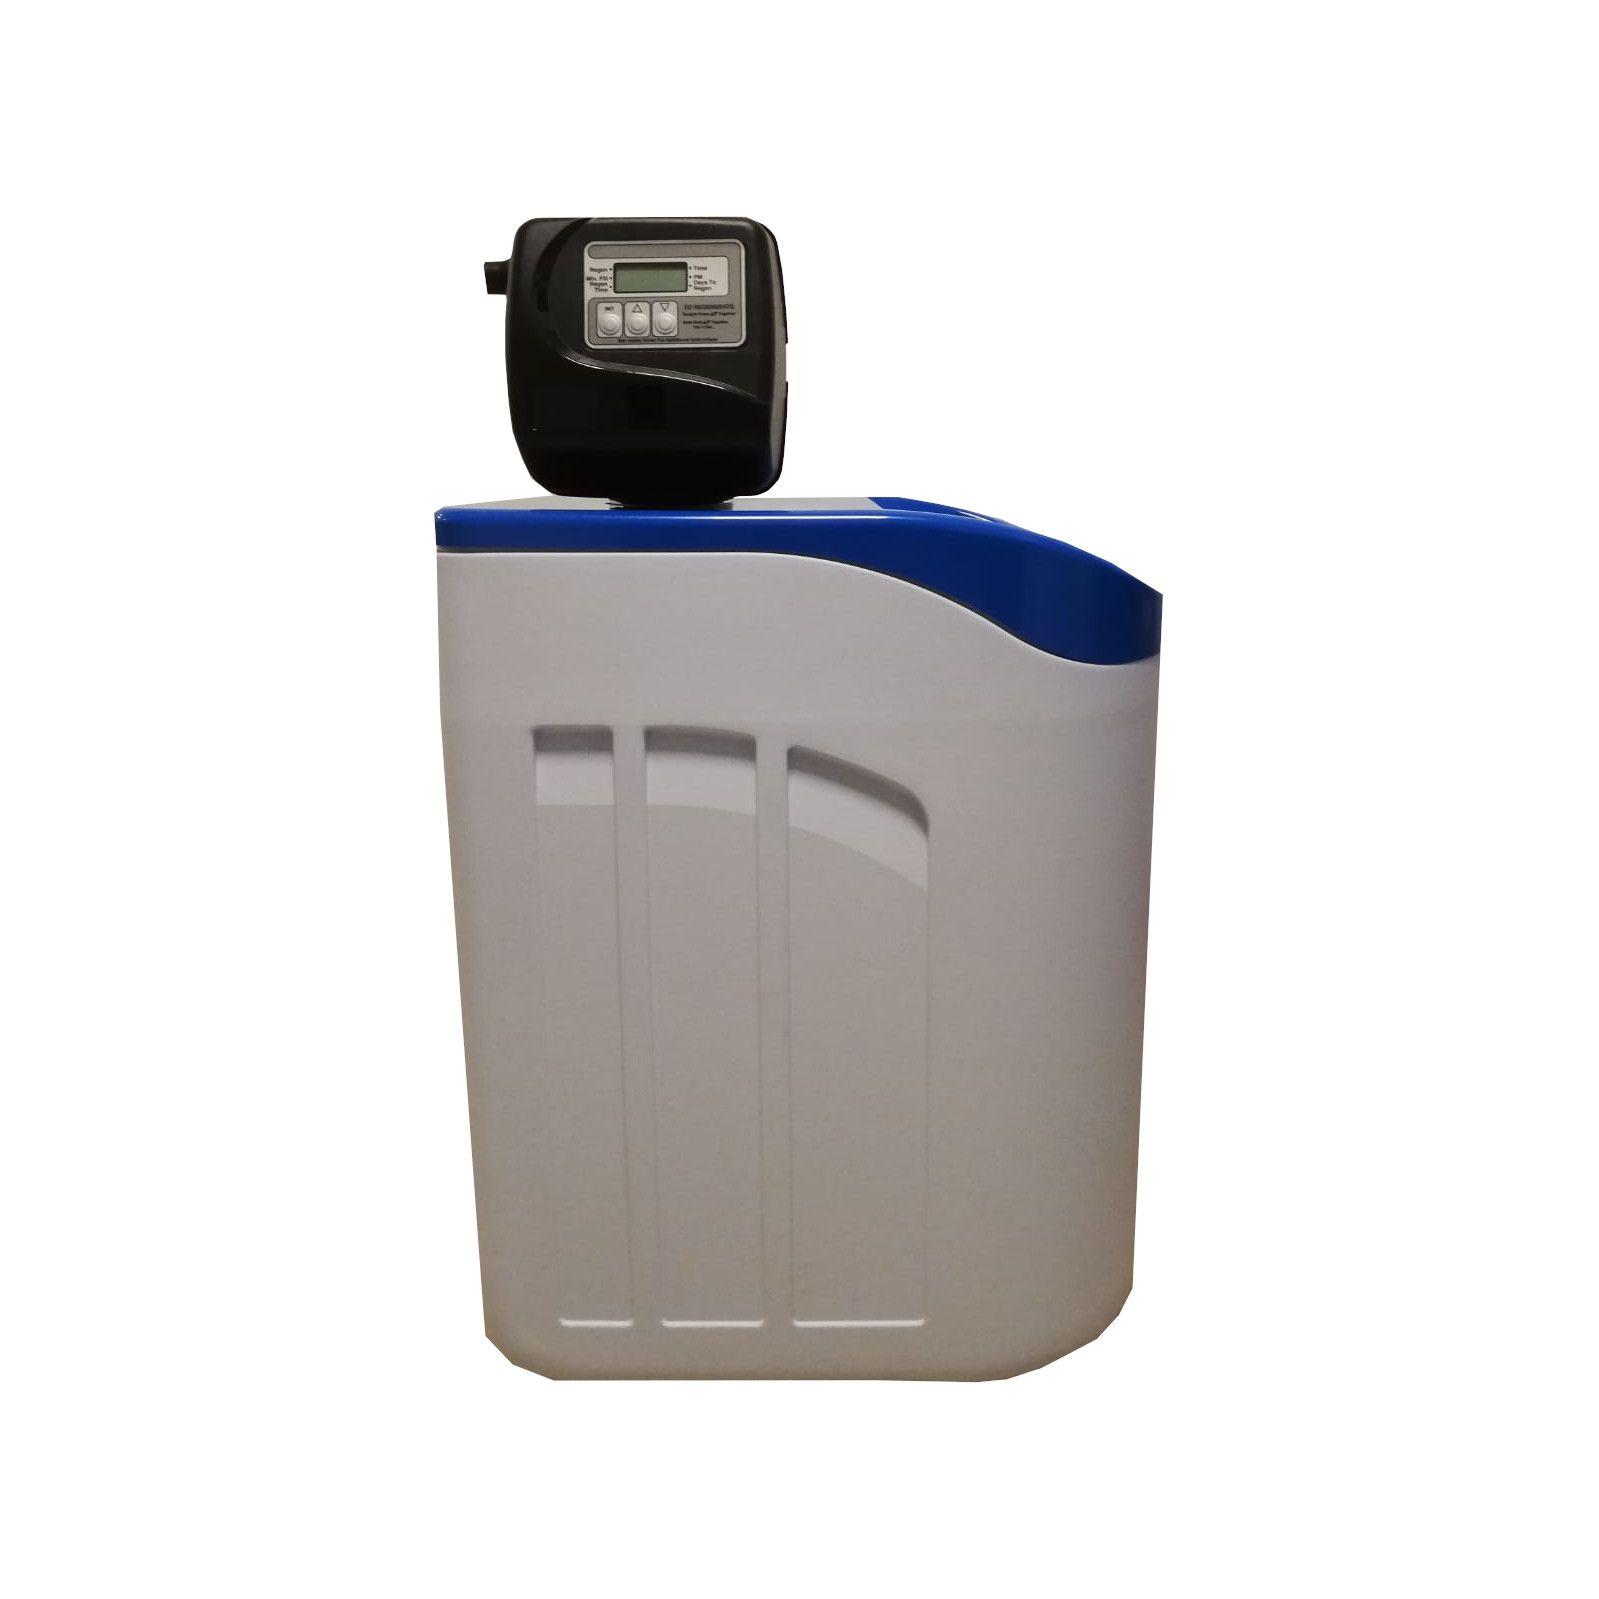 Dedurizator Compact Midi 20-Clack SUA-TCD, Debit 1.2 mc/h, Capacitate filtrare 45.000 litri, Cartus din Rasina Cationica - AquaFilters.ro